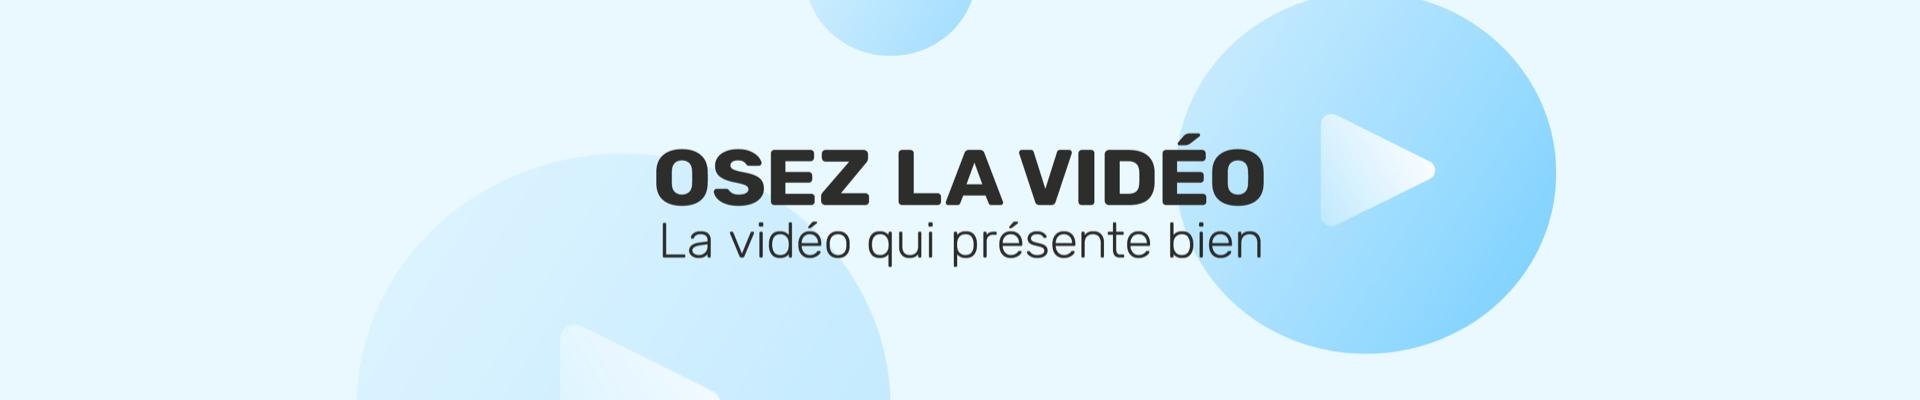 Osez la Vidéo